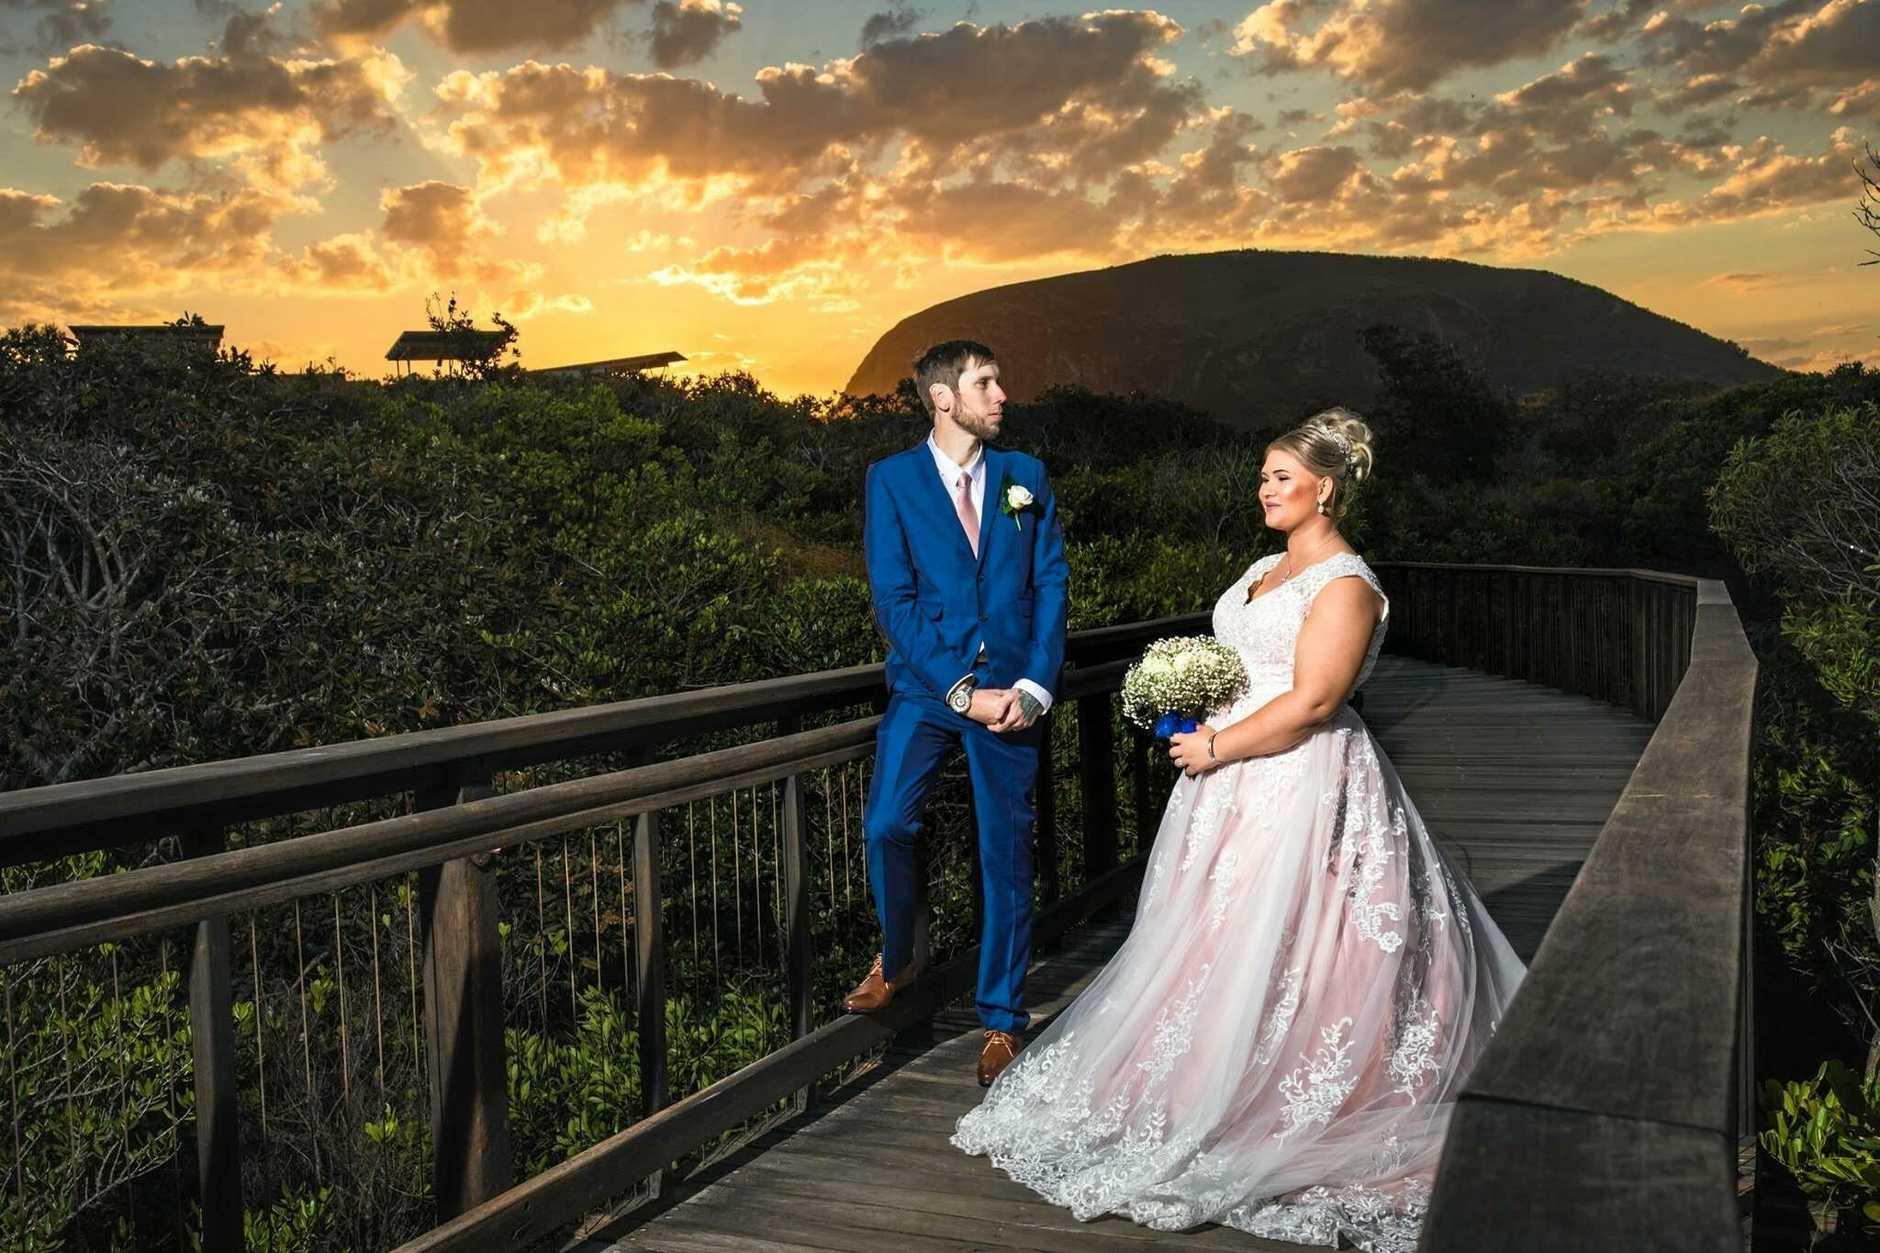 CONGRATS: Casey Picard has married Justin Schmidt.